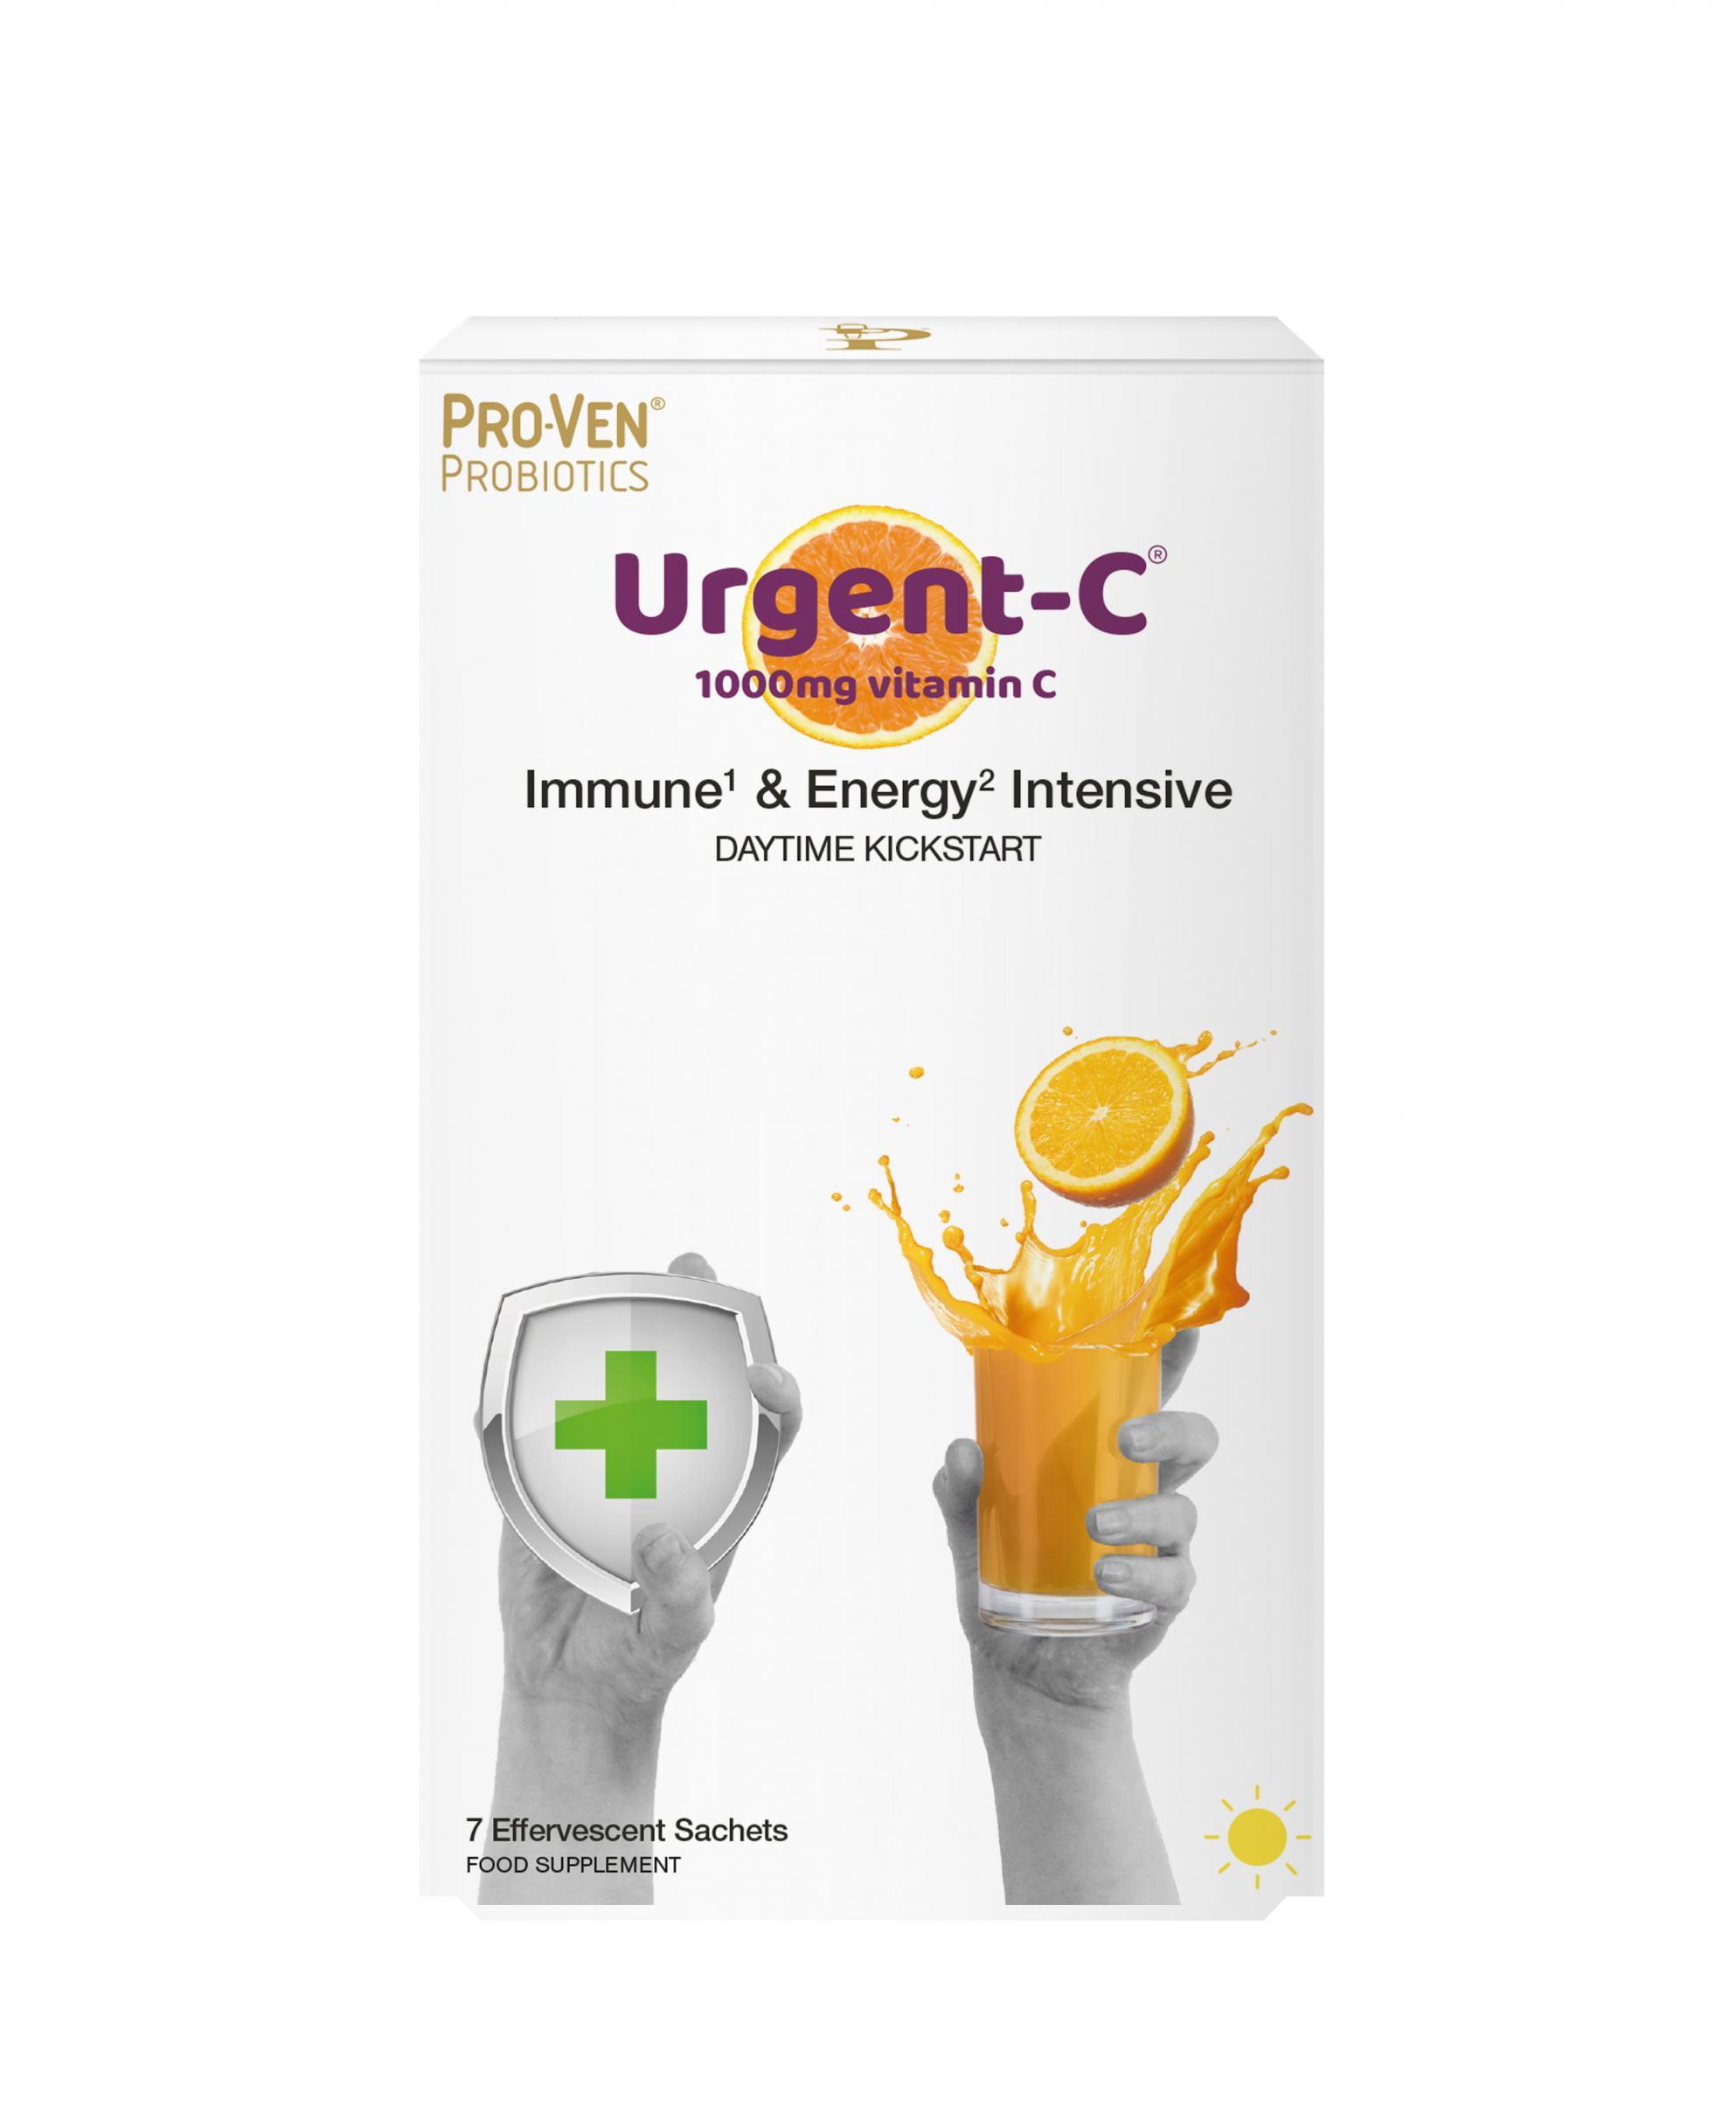 Urgent-C Immune & Energy Intensive - Daytime Kickstart 7 Sachets